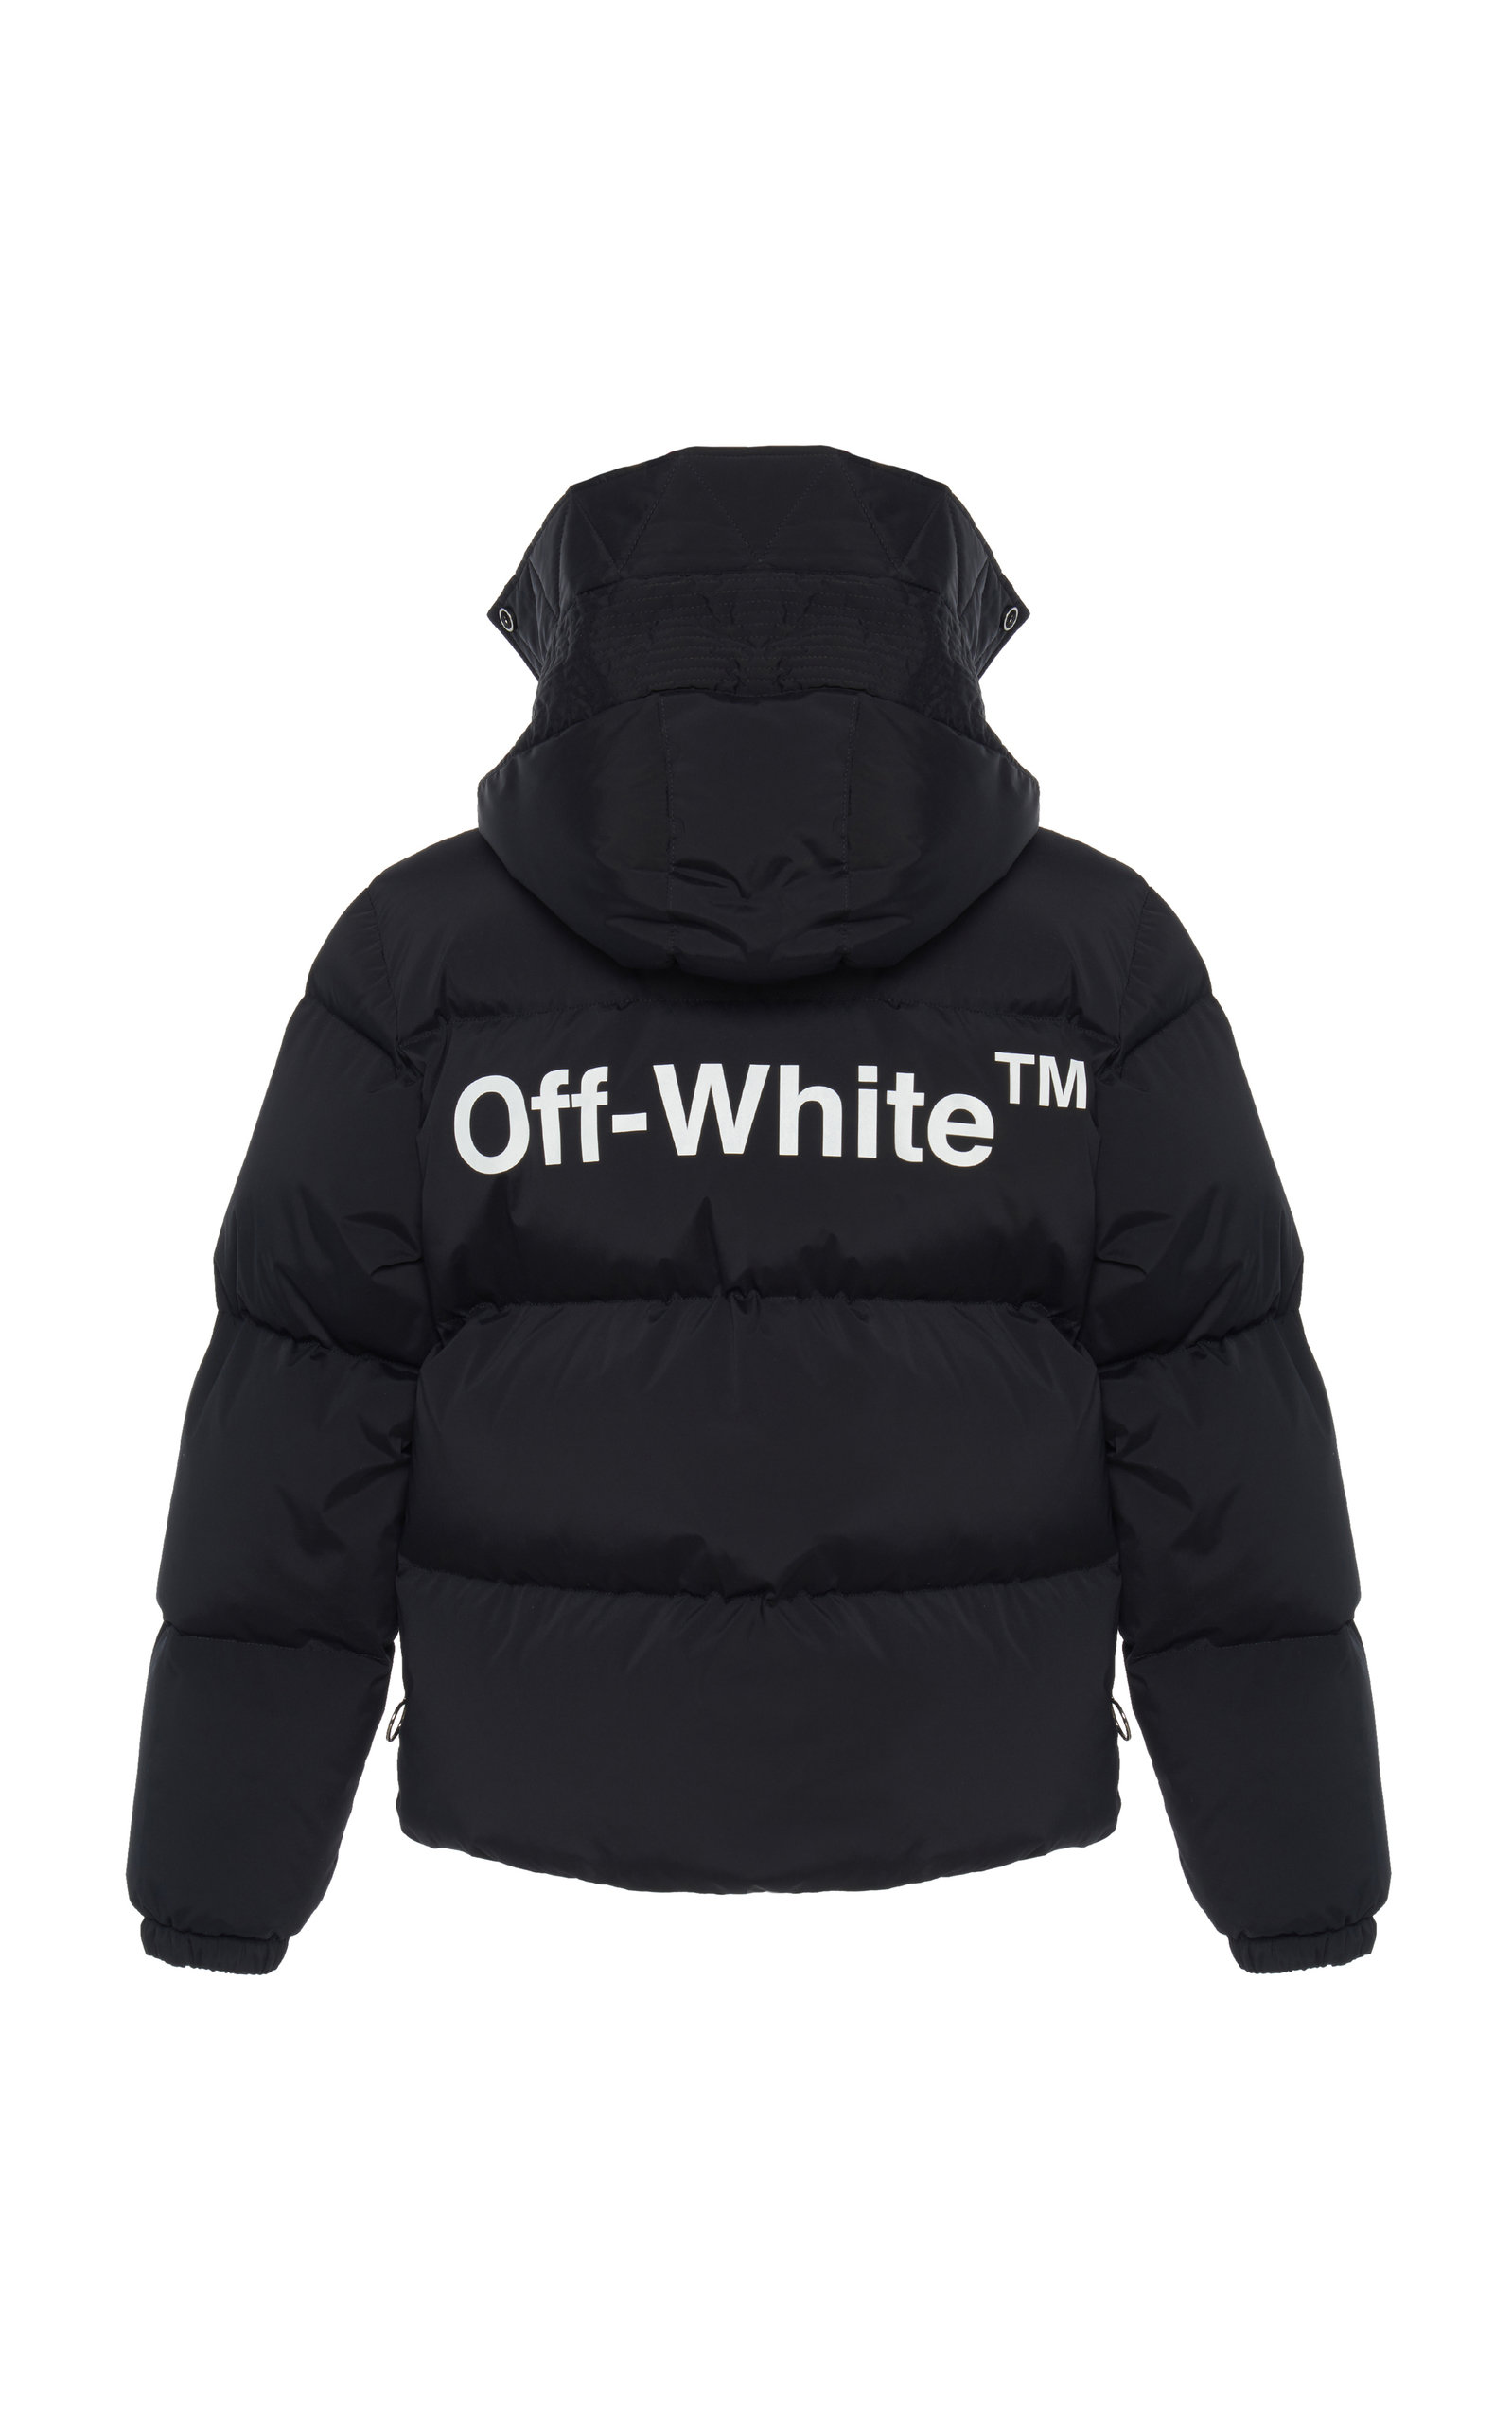 By Virgil Off Jacket Abloh White Operandi Co Hooded Moda Down pq4xWa 8f99f21b051